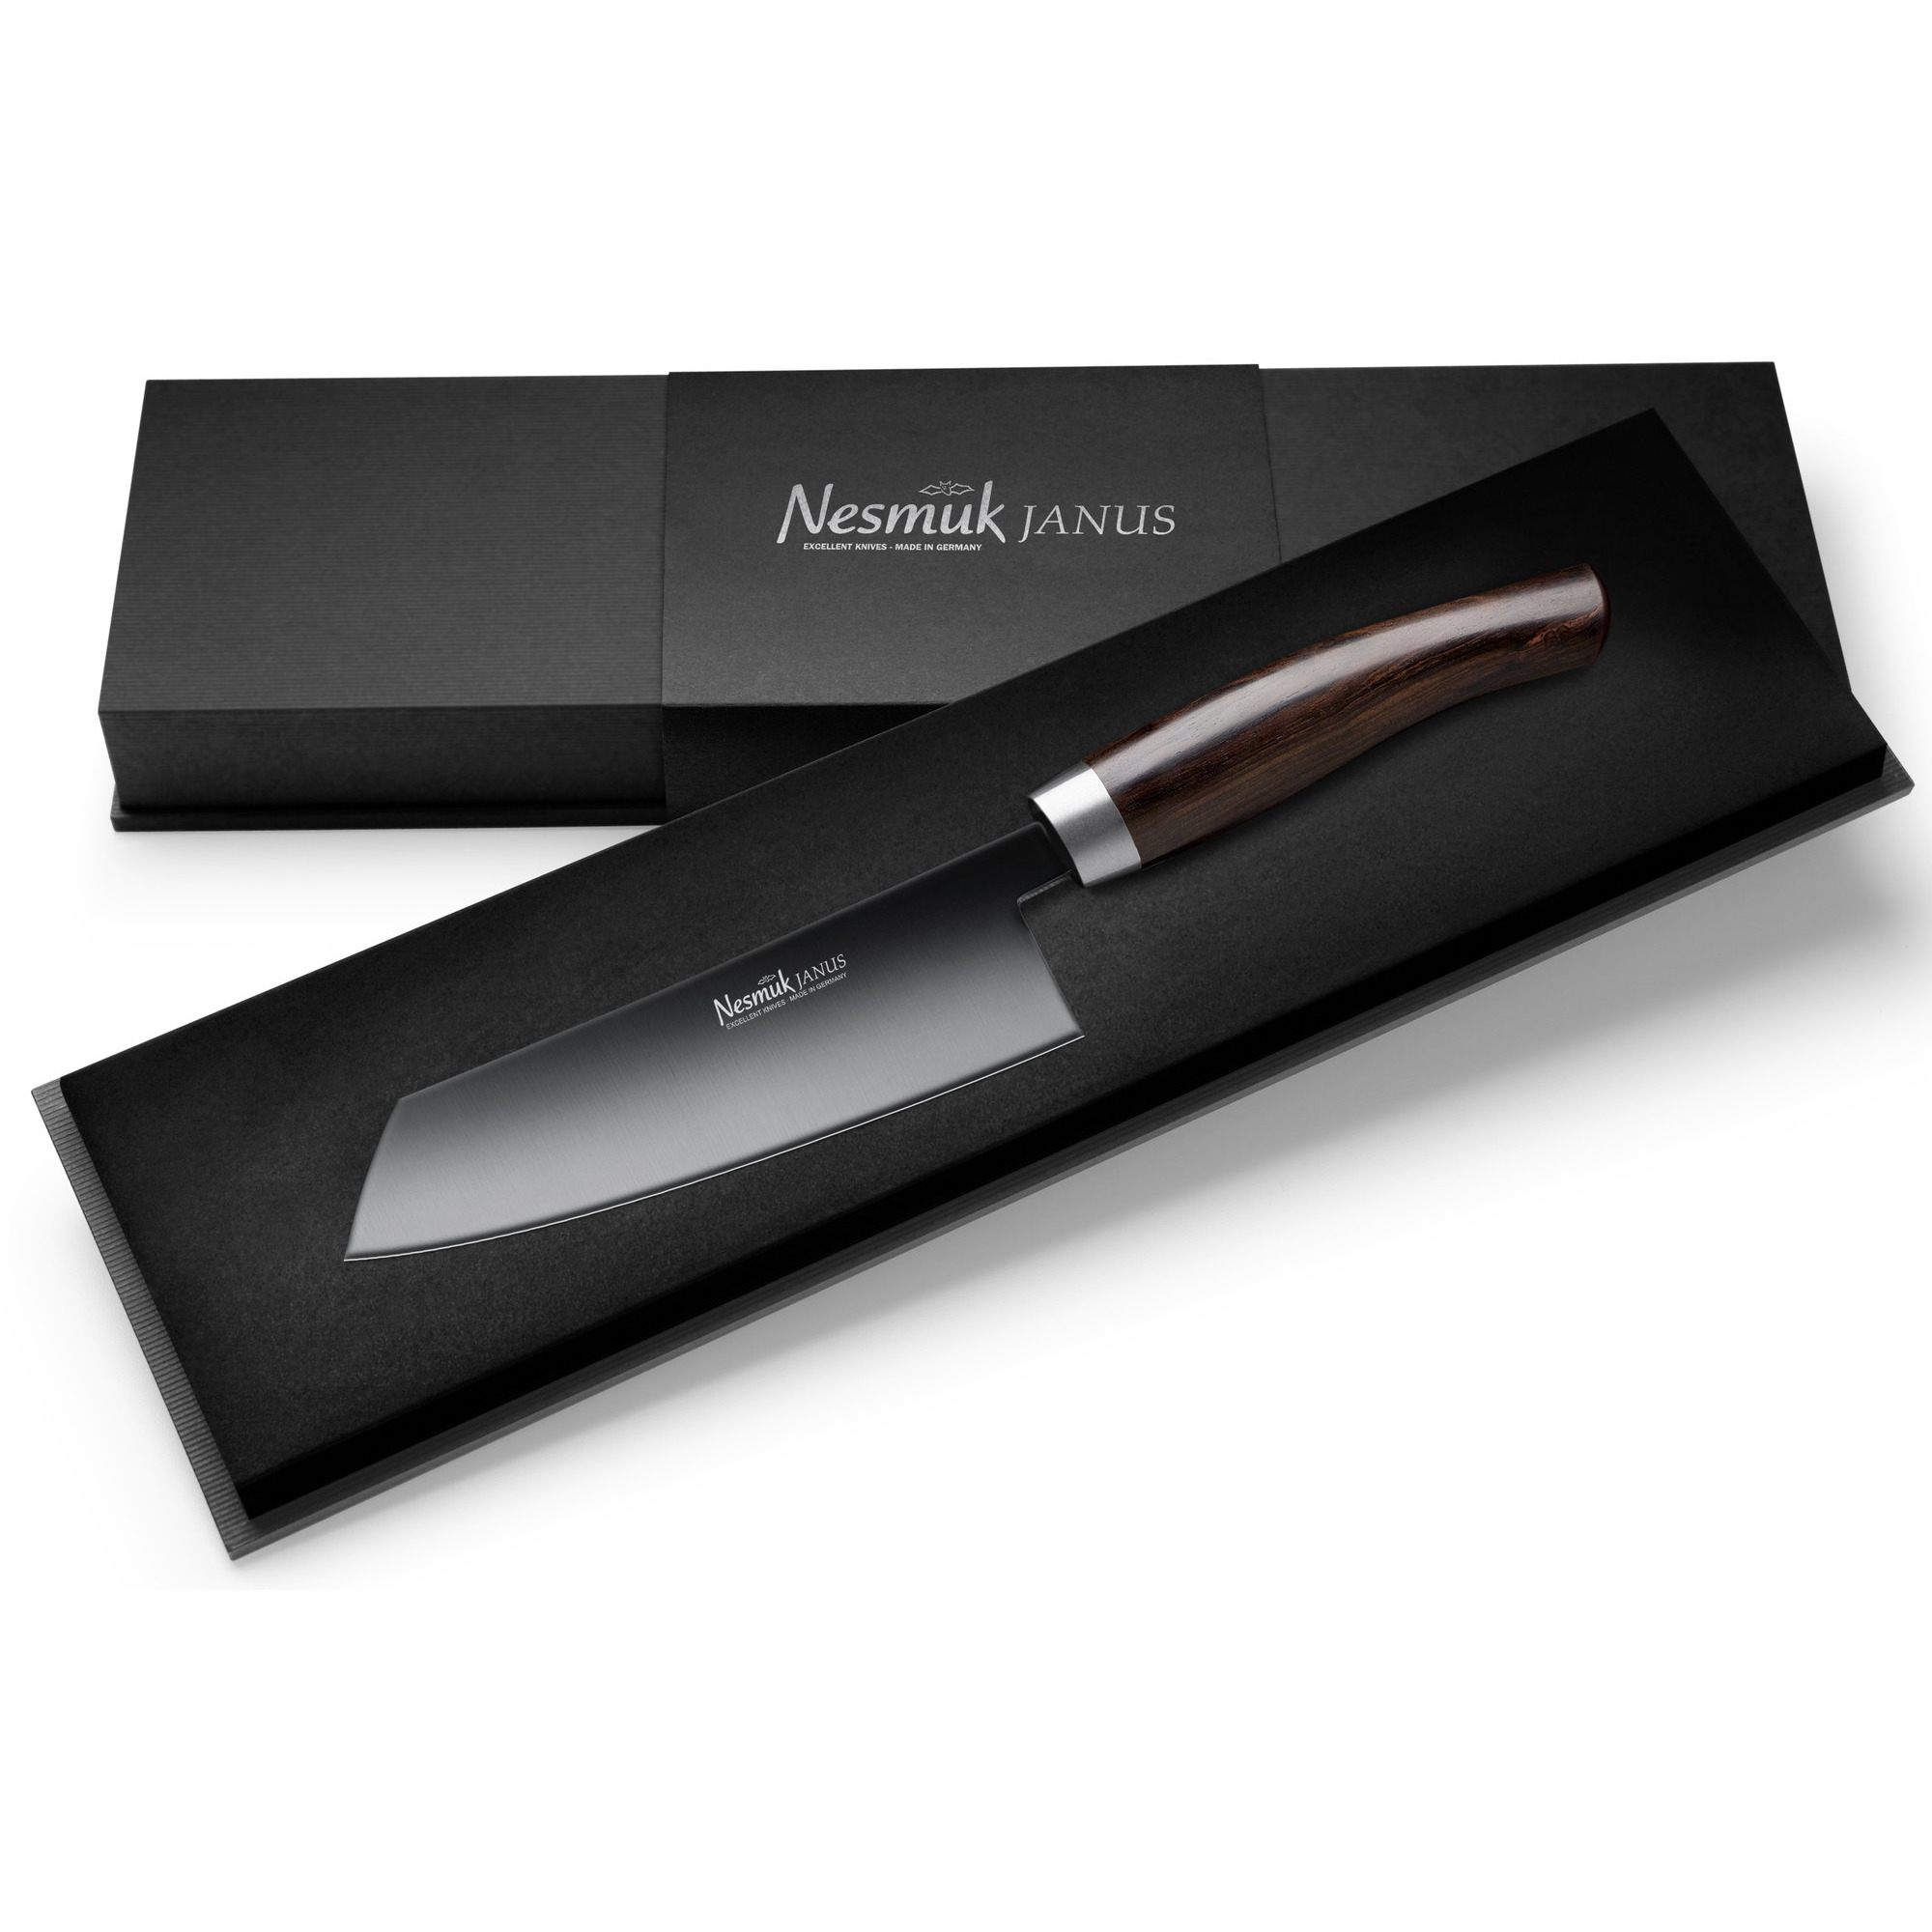 Nesmuk Janus Grenadilla kockkniv 14 cm.